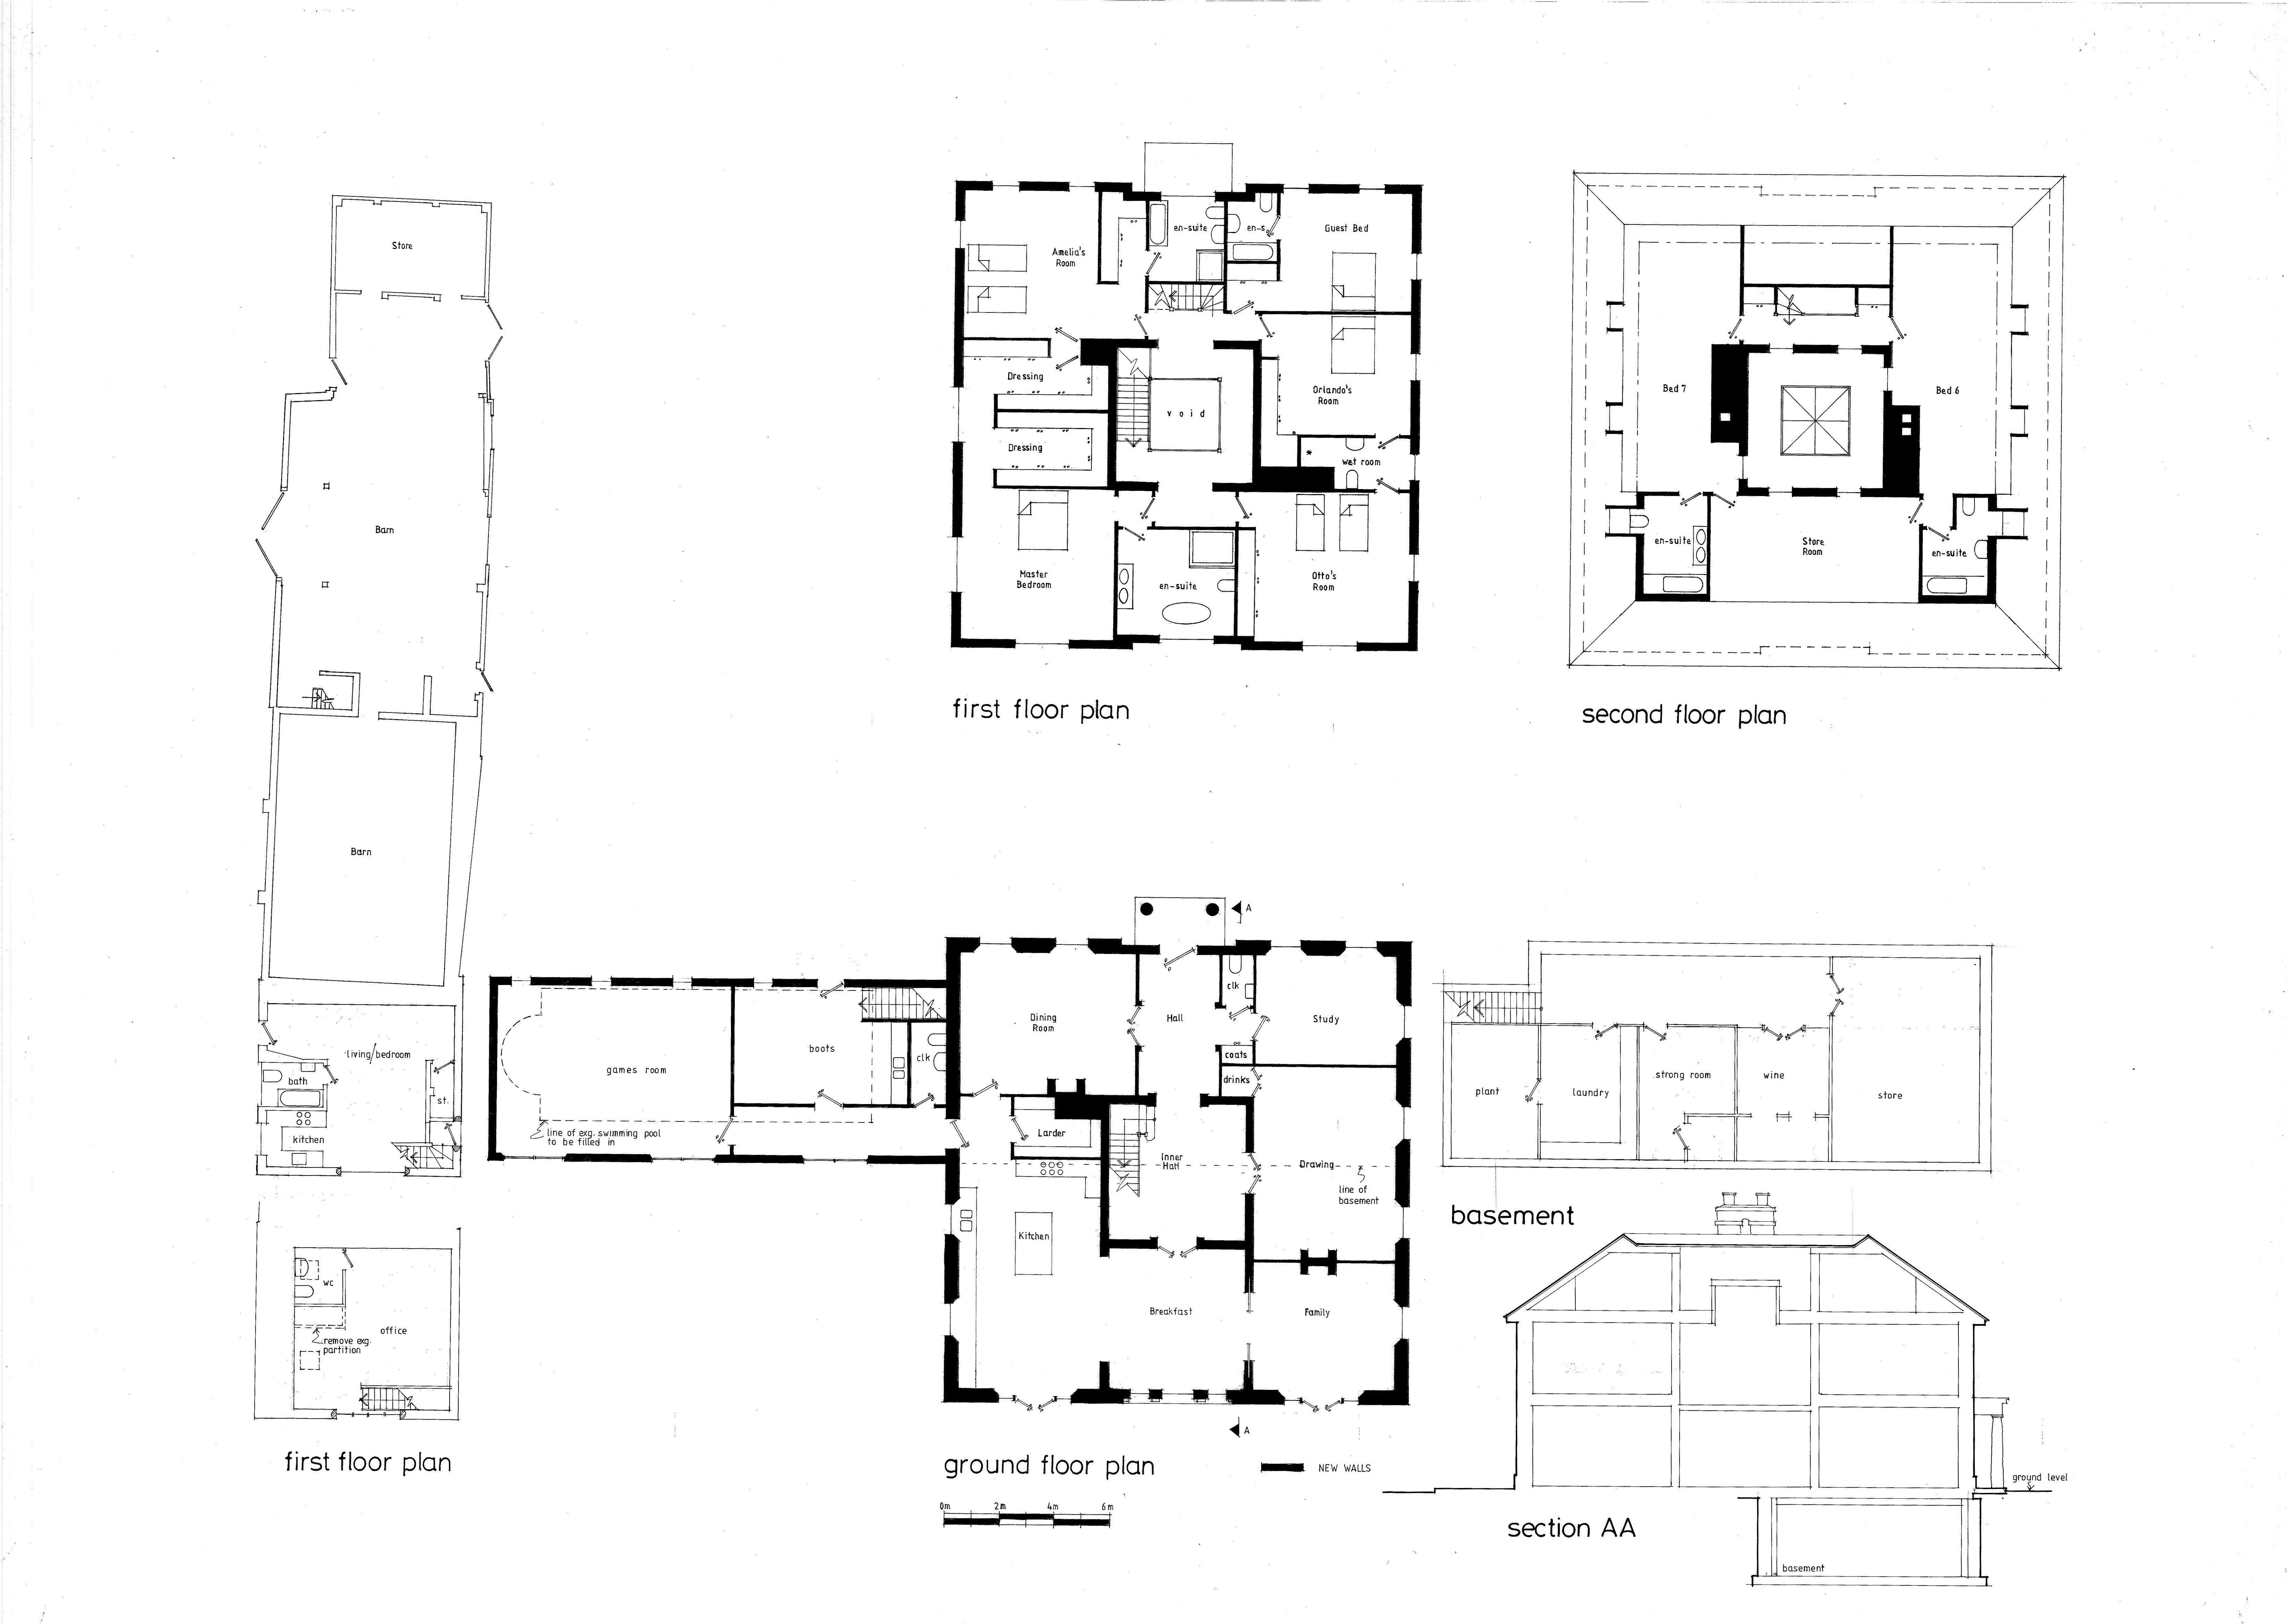 Balstone Farm House Balstone Farm Lane Ibworth Tadley Hampshire Rg26 5tj Www Basingstoke Gov Uk 13 021 Vintage House Plans House Floor Plans Floor Plans